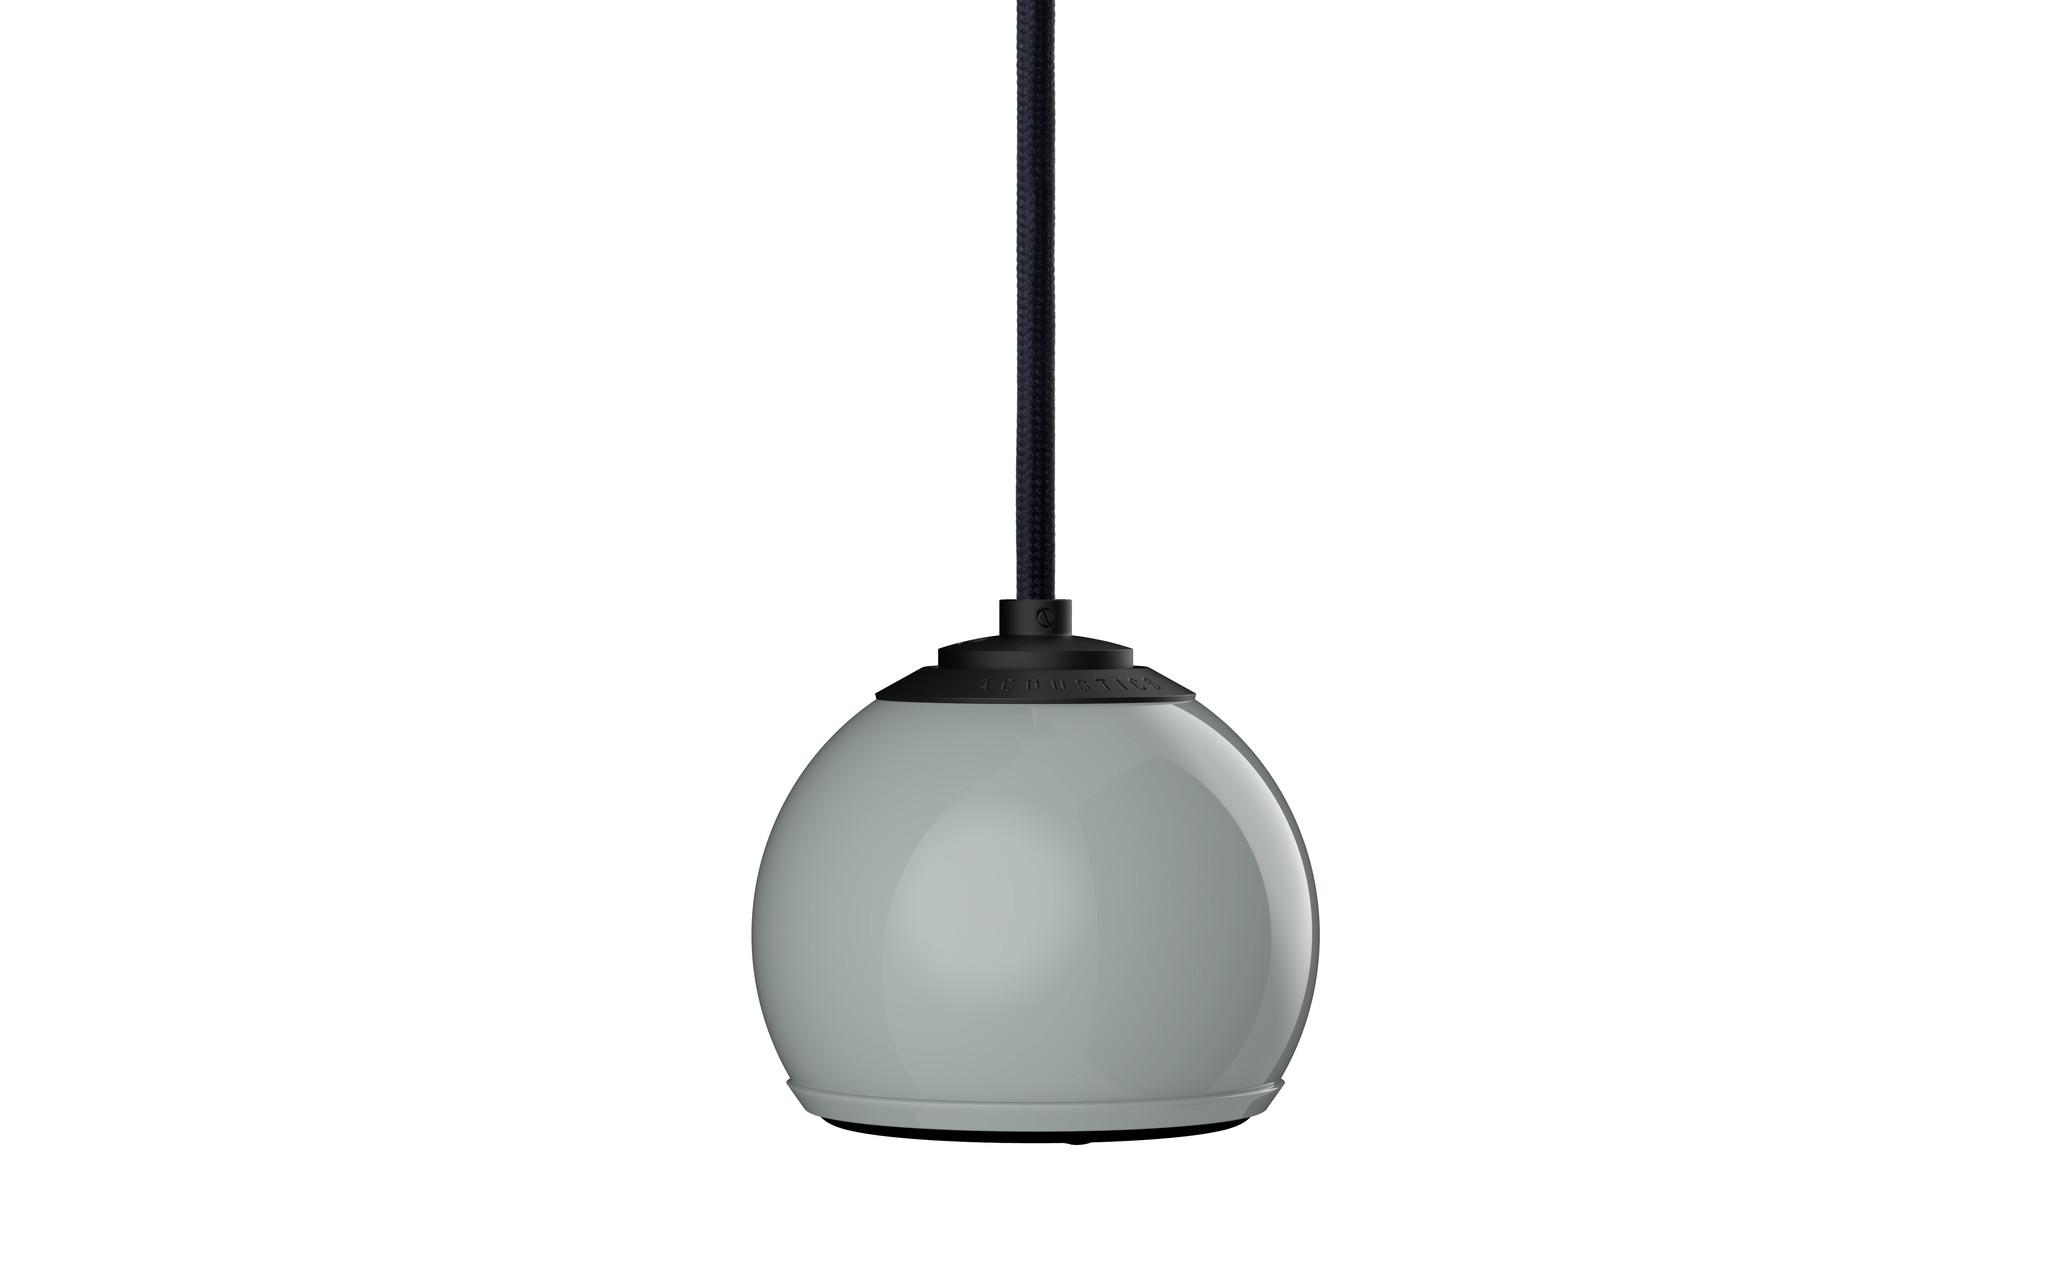 Gallo Acoustics Gallo SE Micro Droplet - Hangende Speaker - Grijs